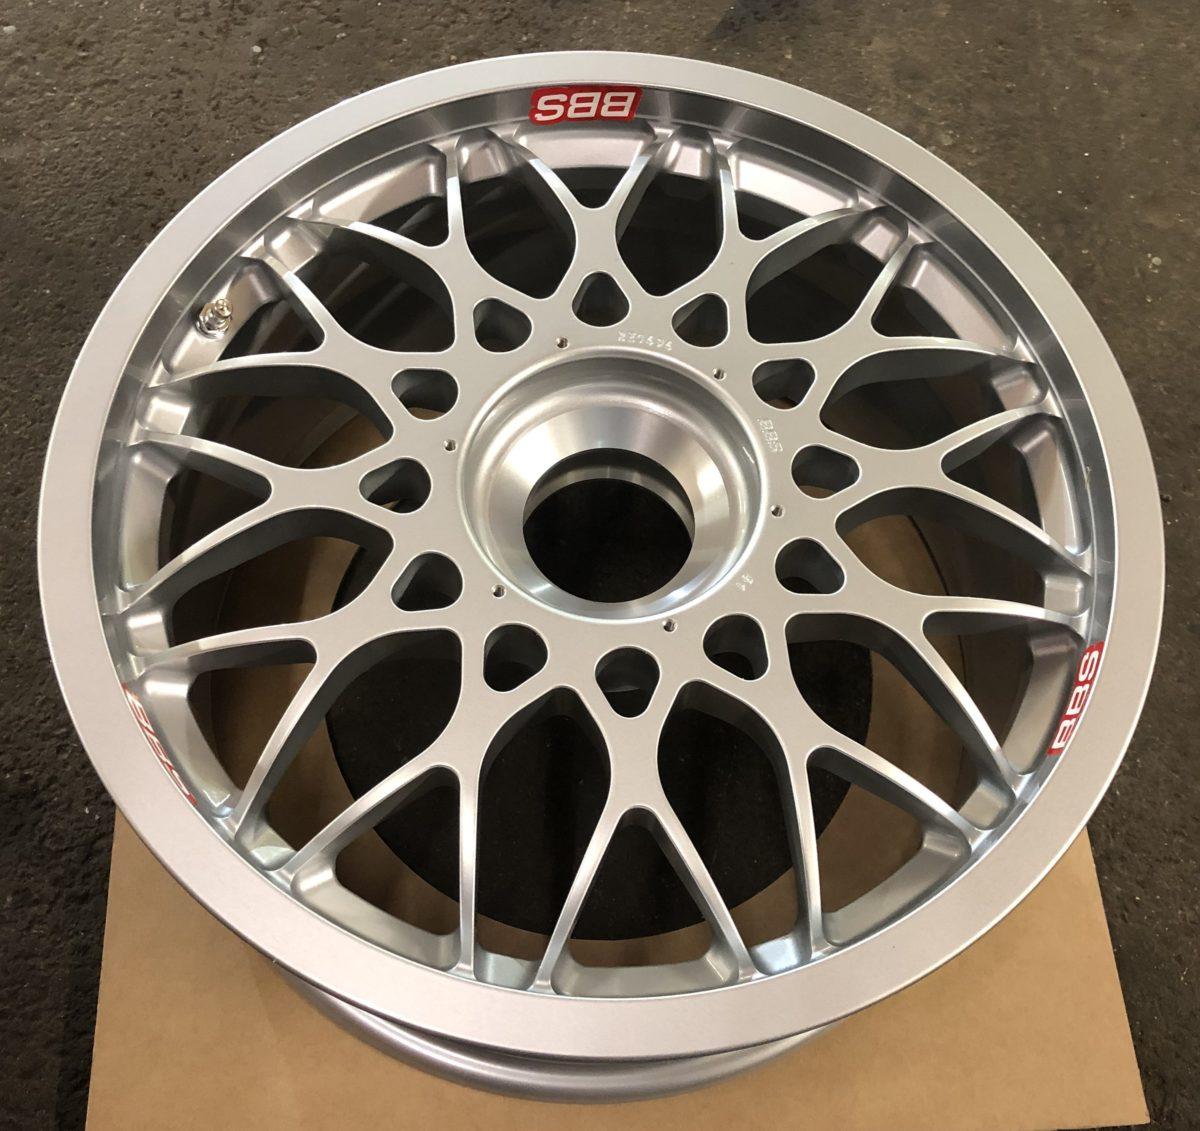 E30 M3 Dtm Wheels